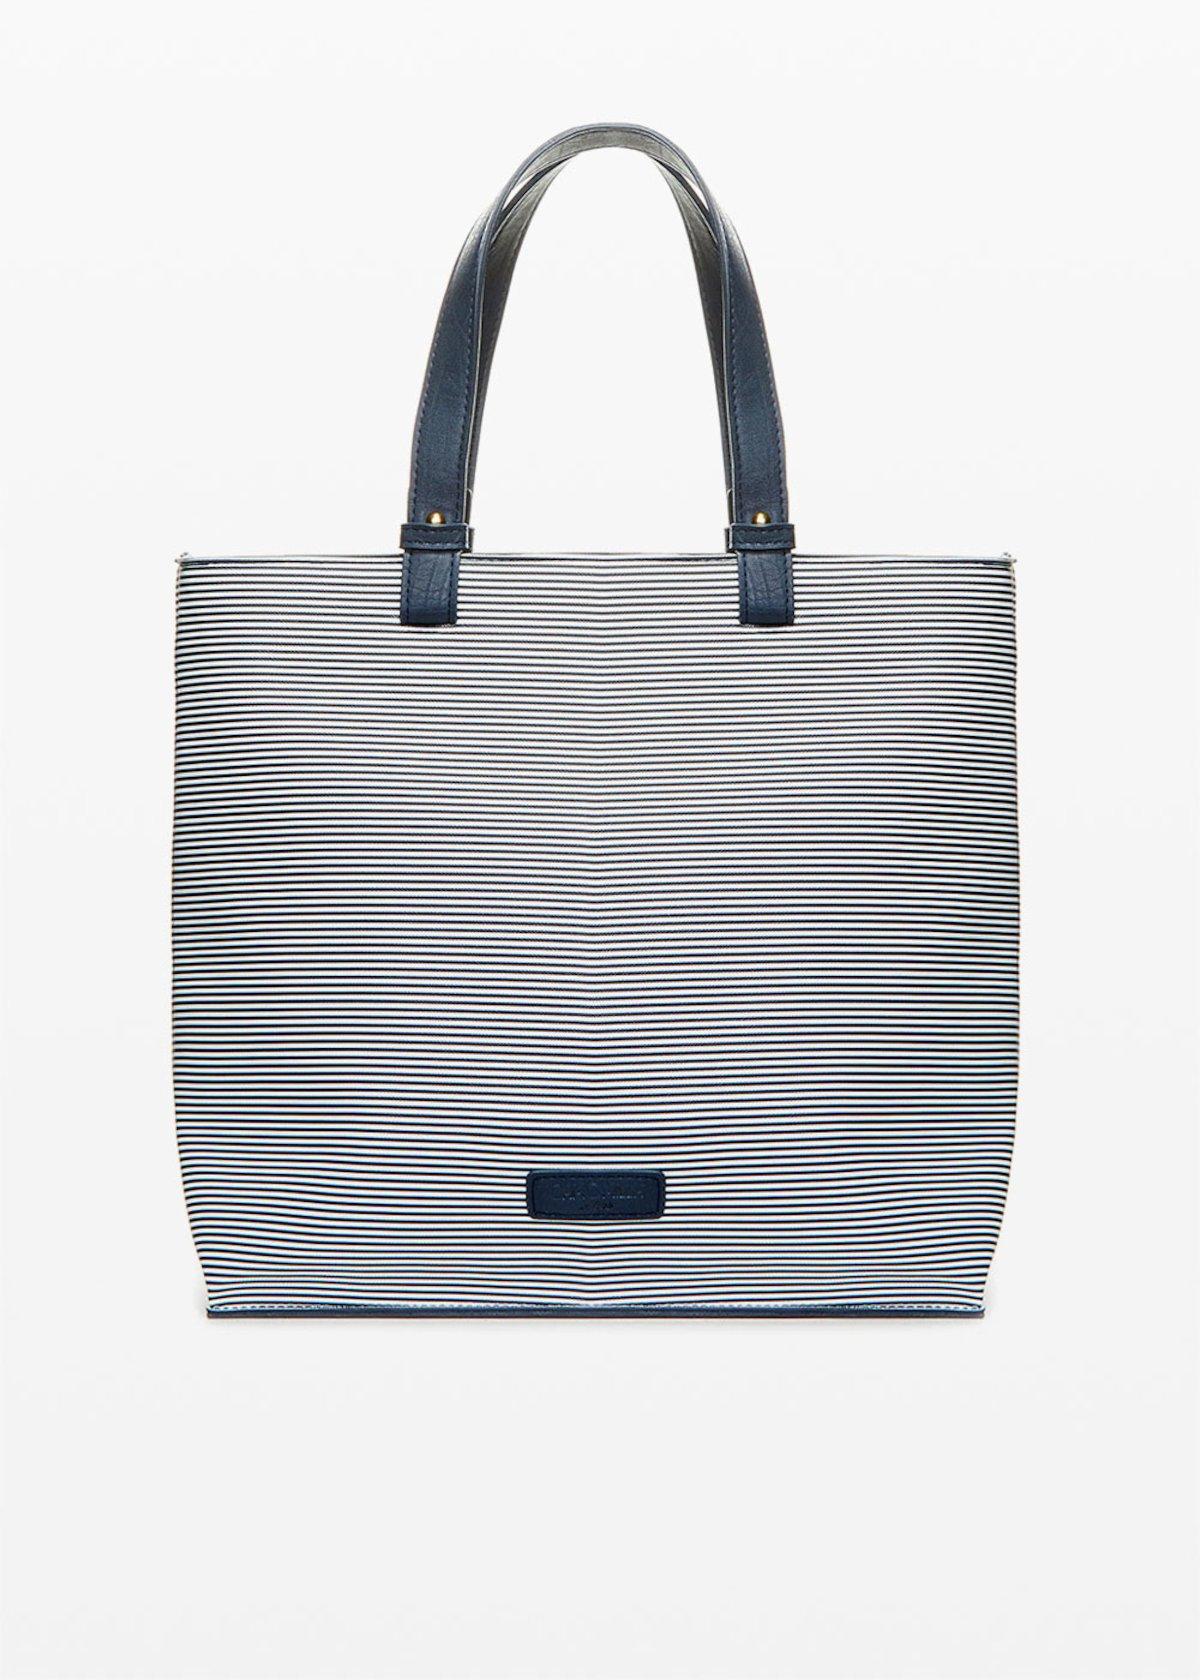 Bruce bag stripes fantasy - Blue / White Stripes - Woman